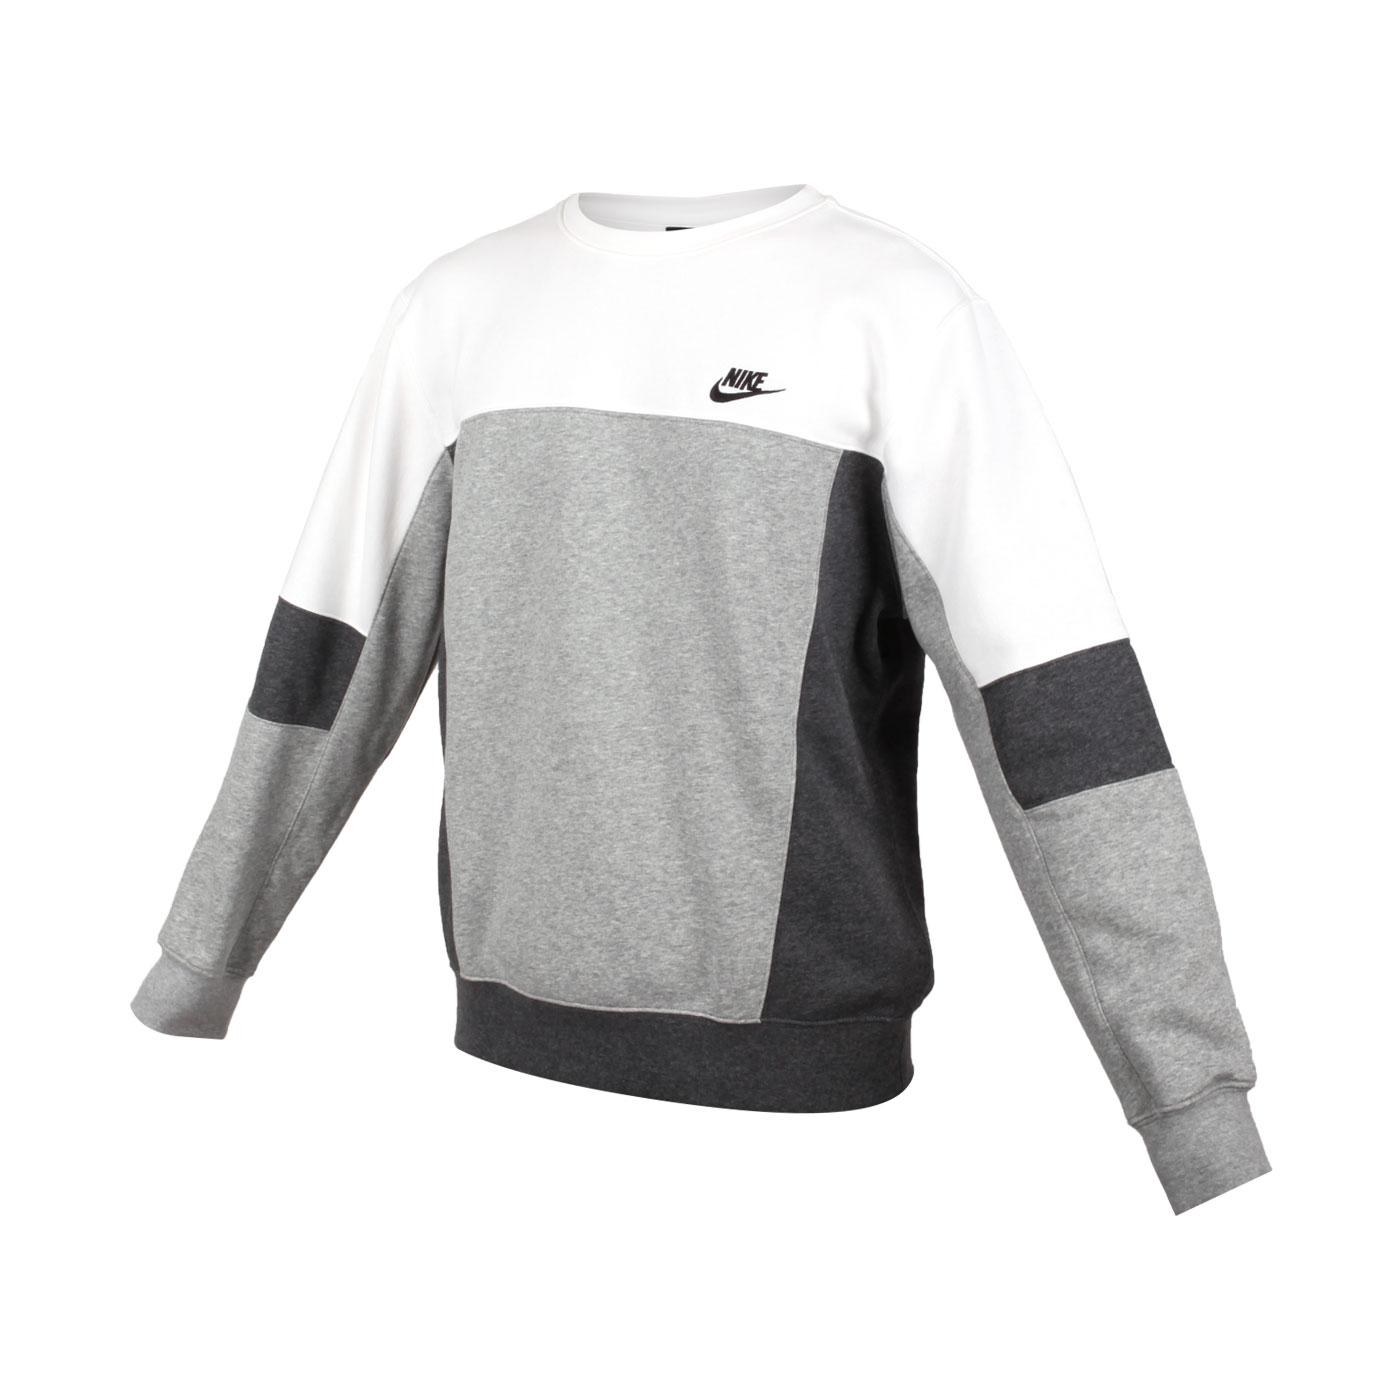 NIKE 男款長袖T恤 CZ9967-100 - 白灰黑